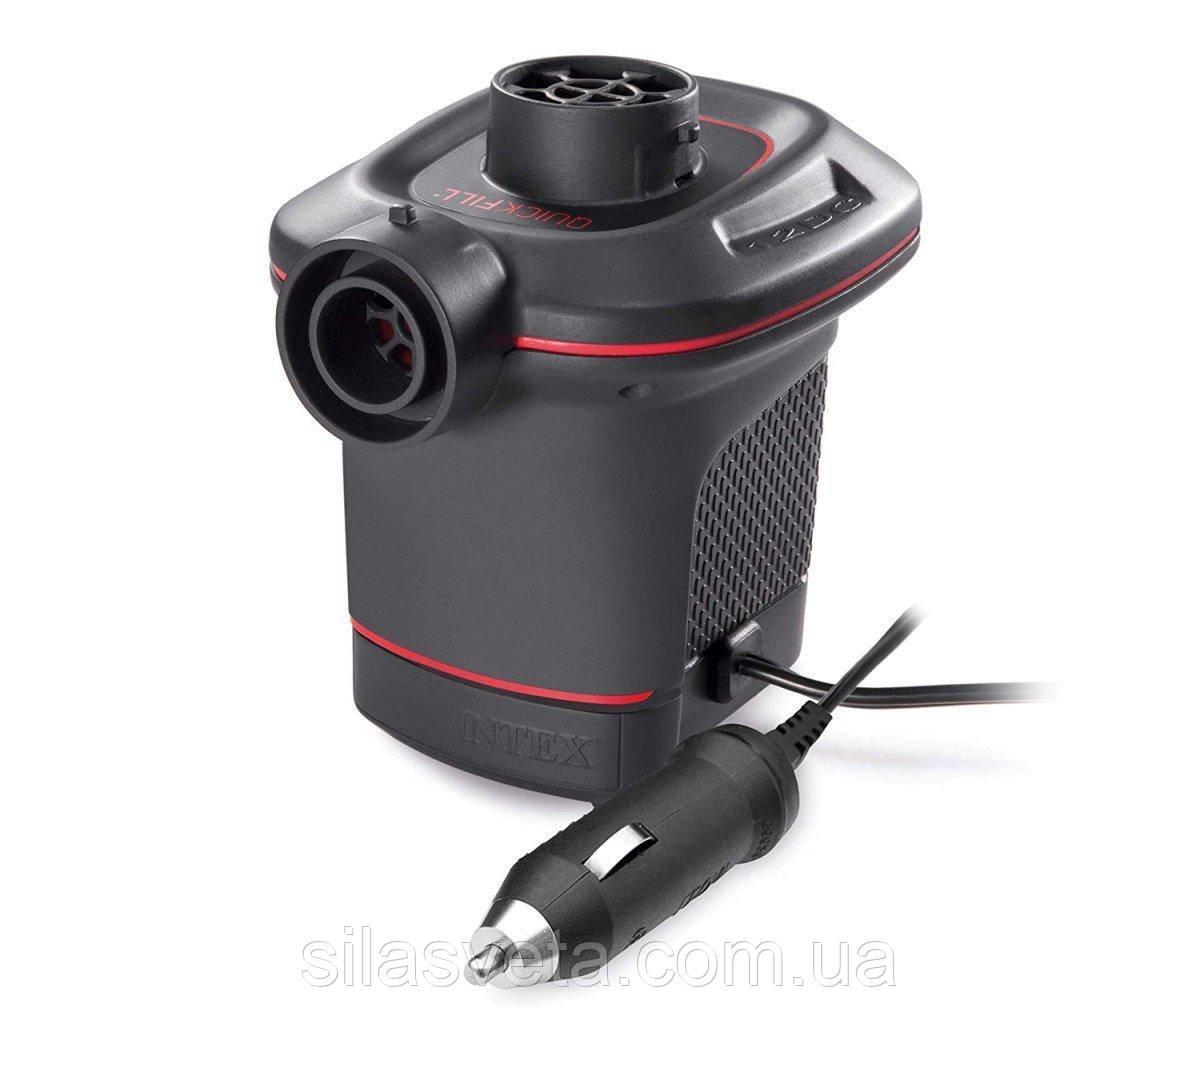 Электрический насос от прикуривателя 12V, Intex 66636 Quick-Fill с тремя насадками (600 л/мин)